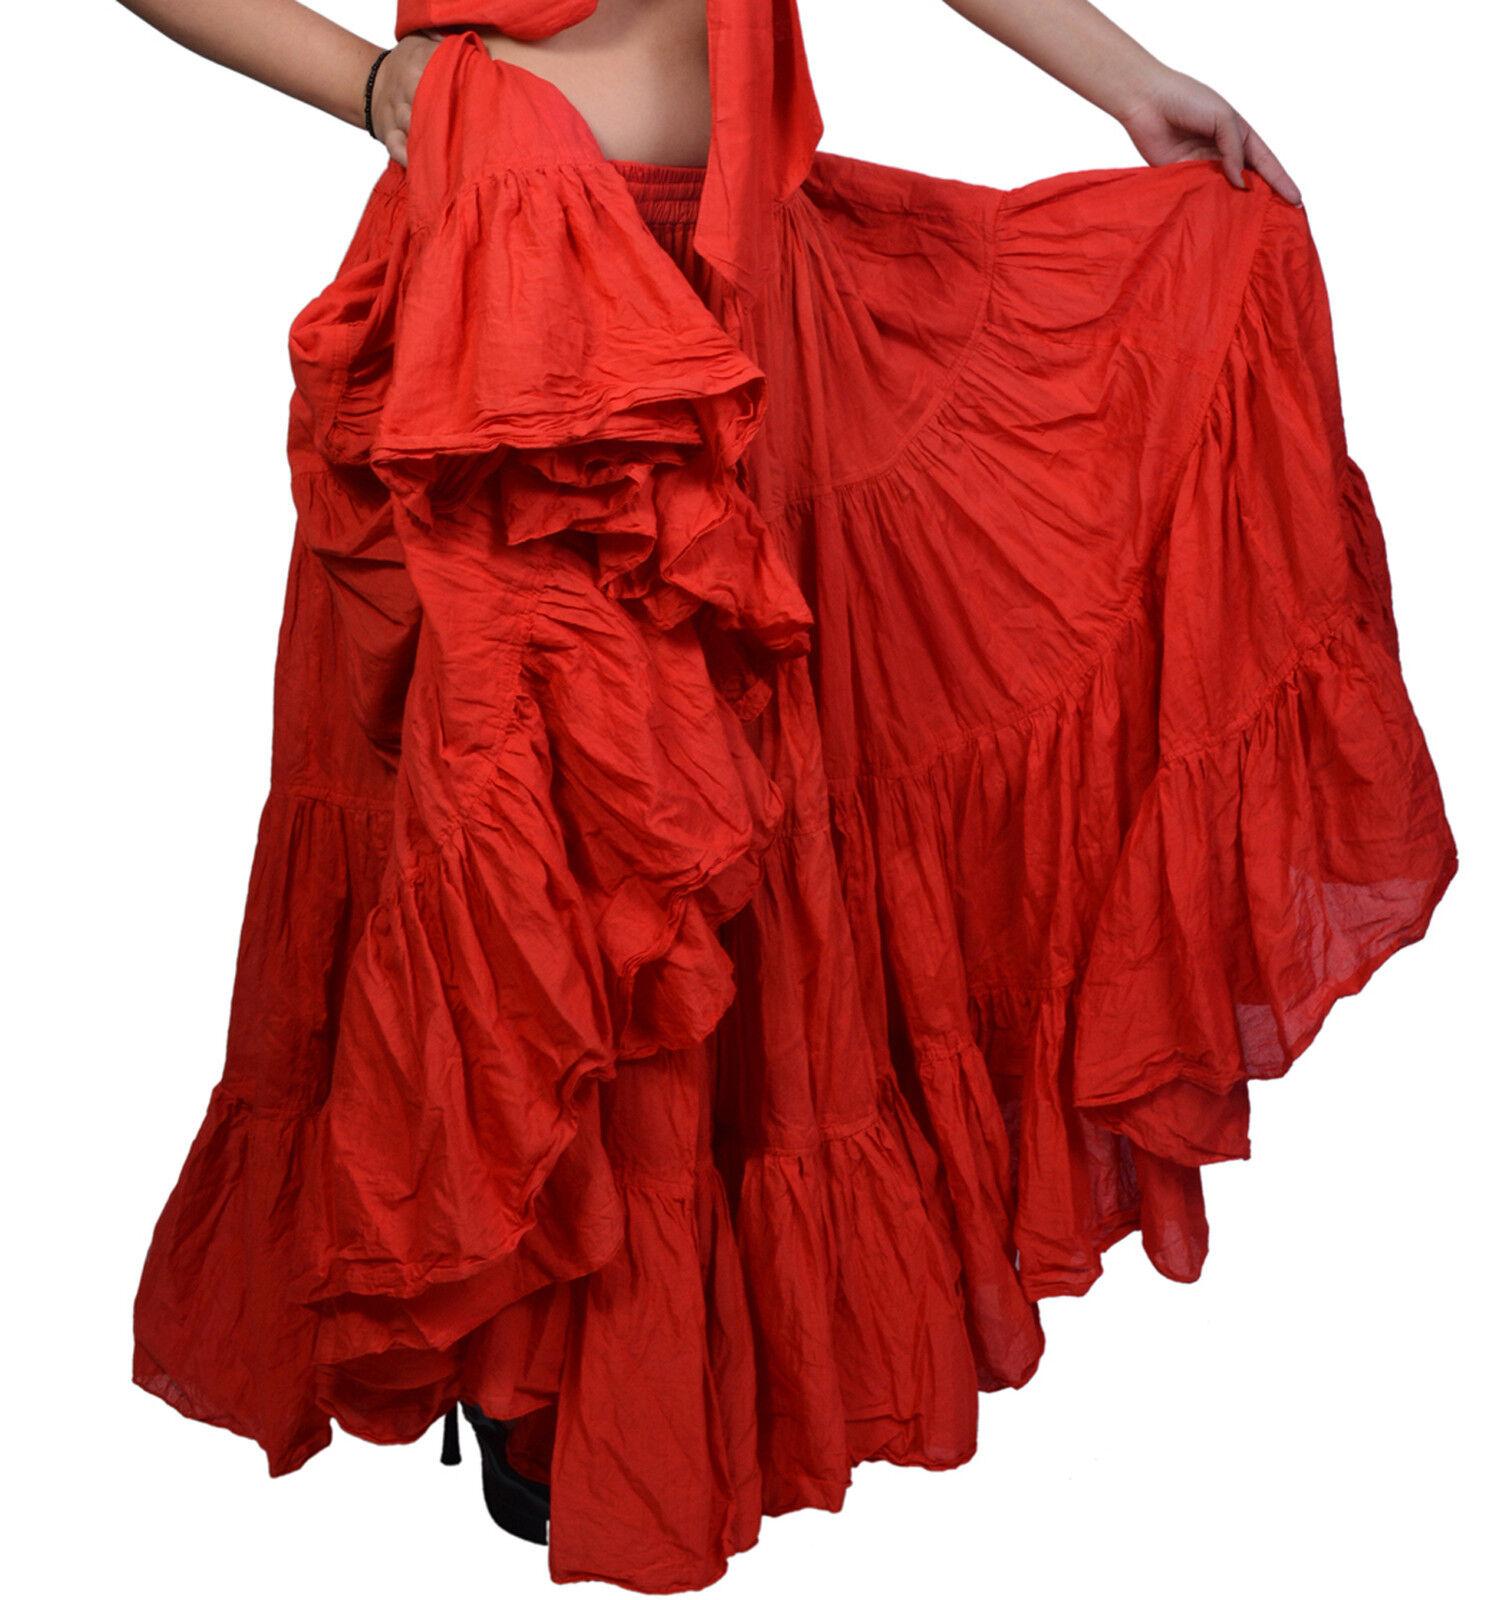 Wevez ATS Tribal Orientale Style Belly Dance 25 Yard Skirts Flamenco